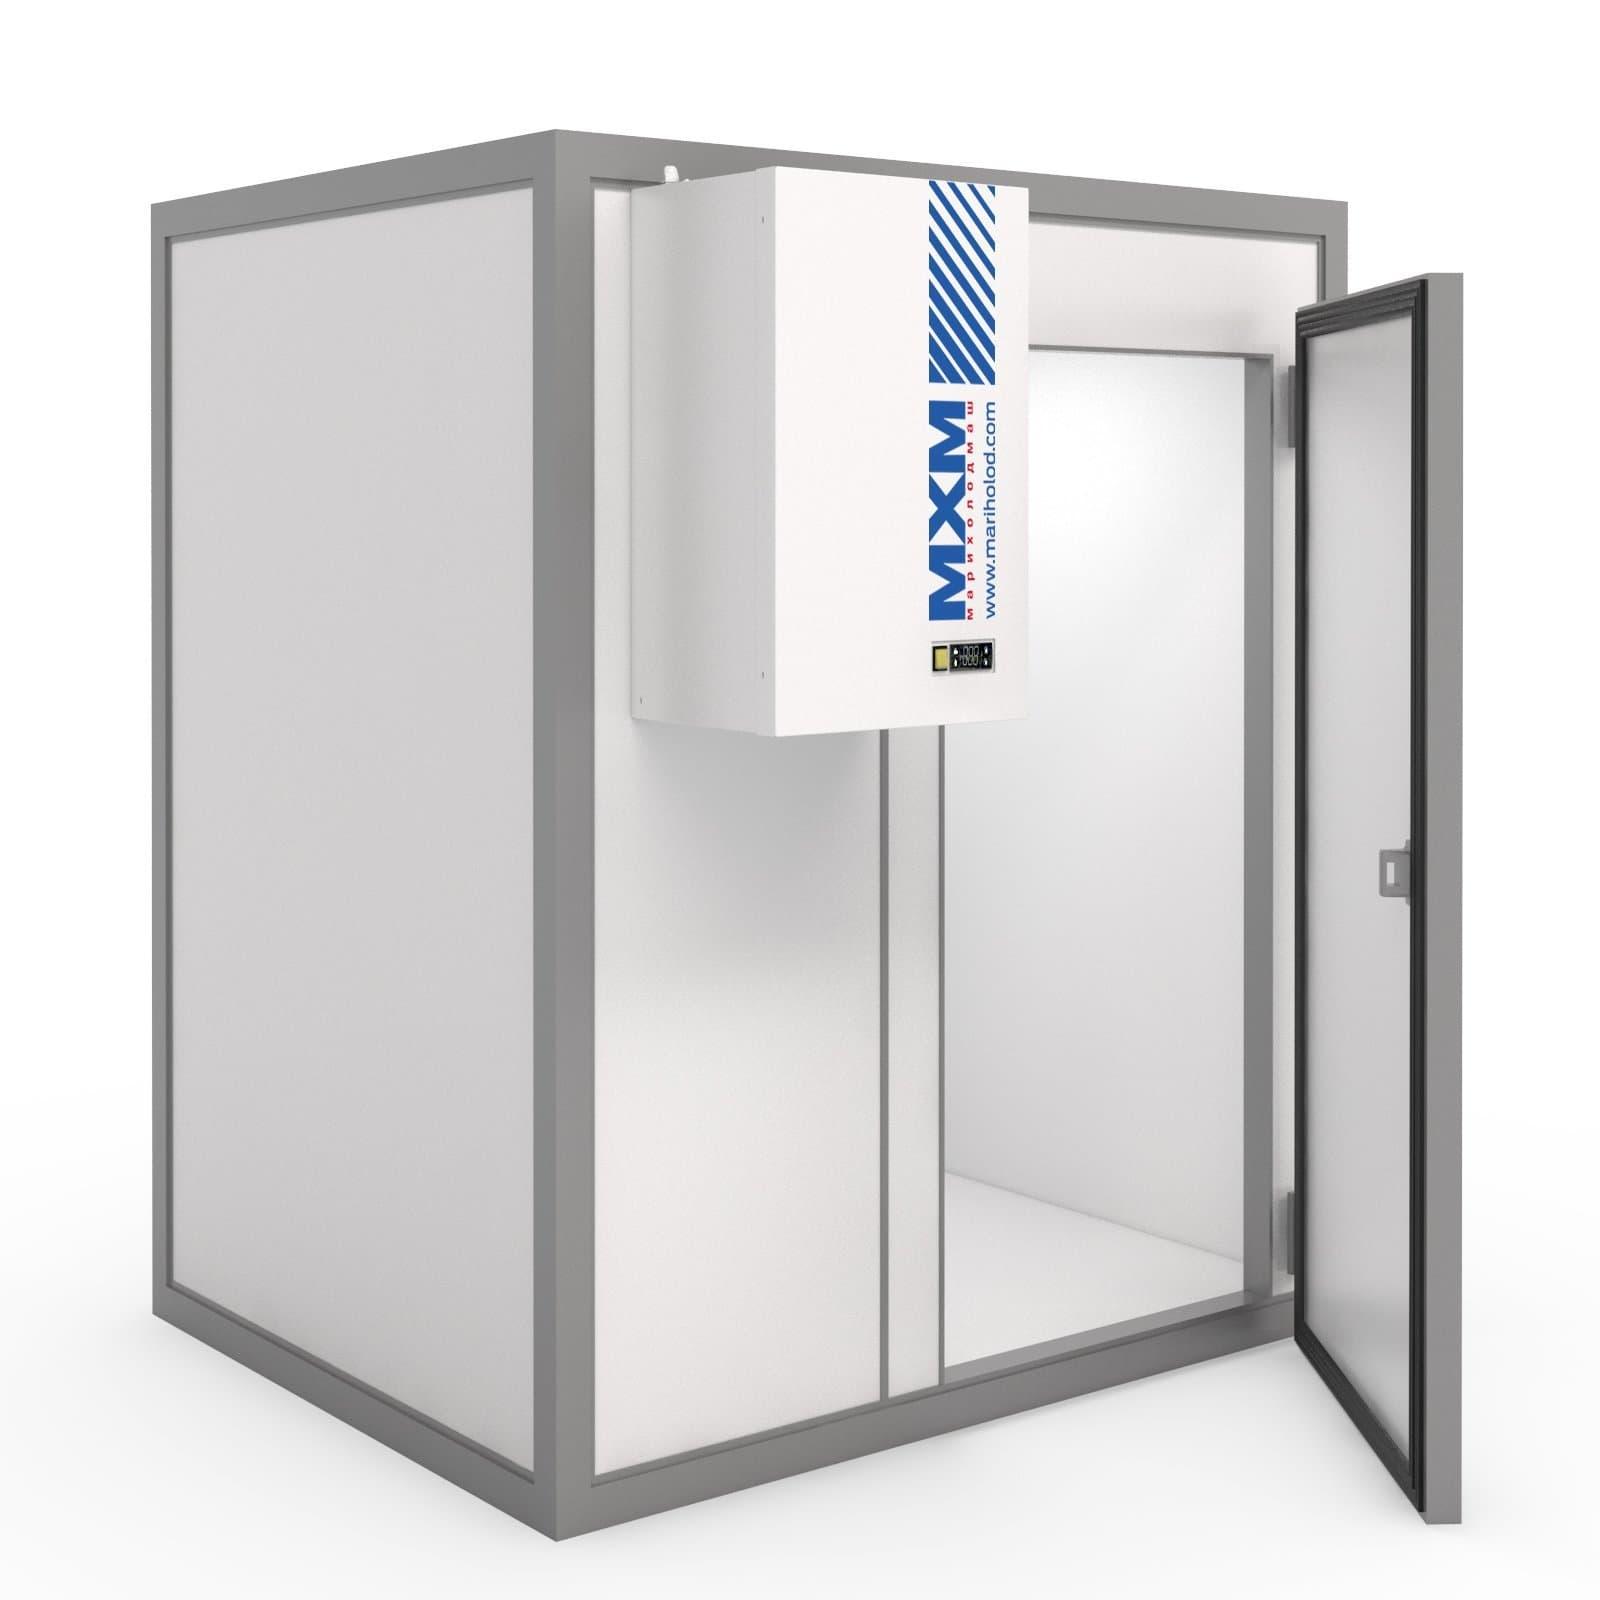 Камера холодильная КХН-101,02 (2560×18460×2460 мм)